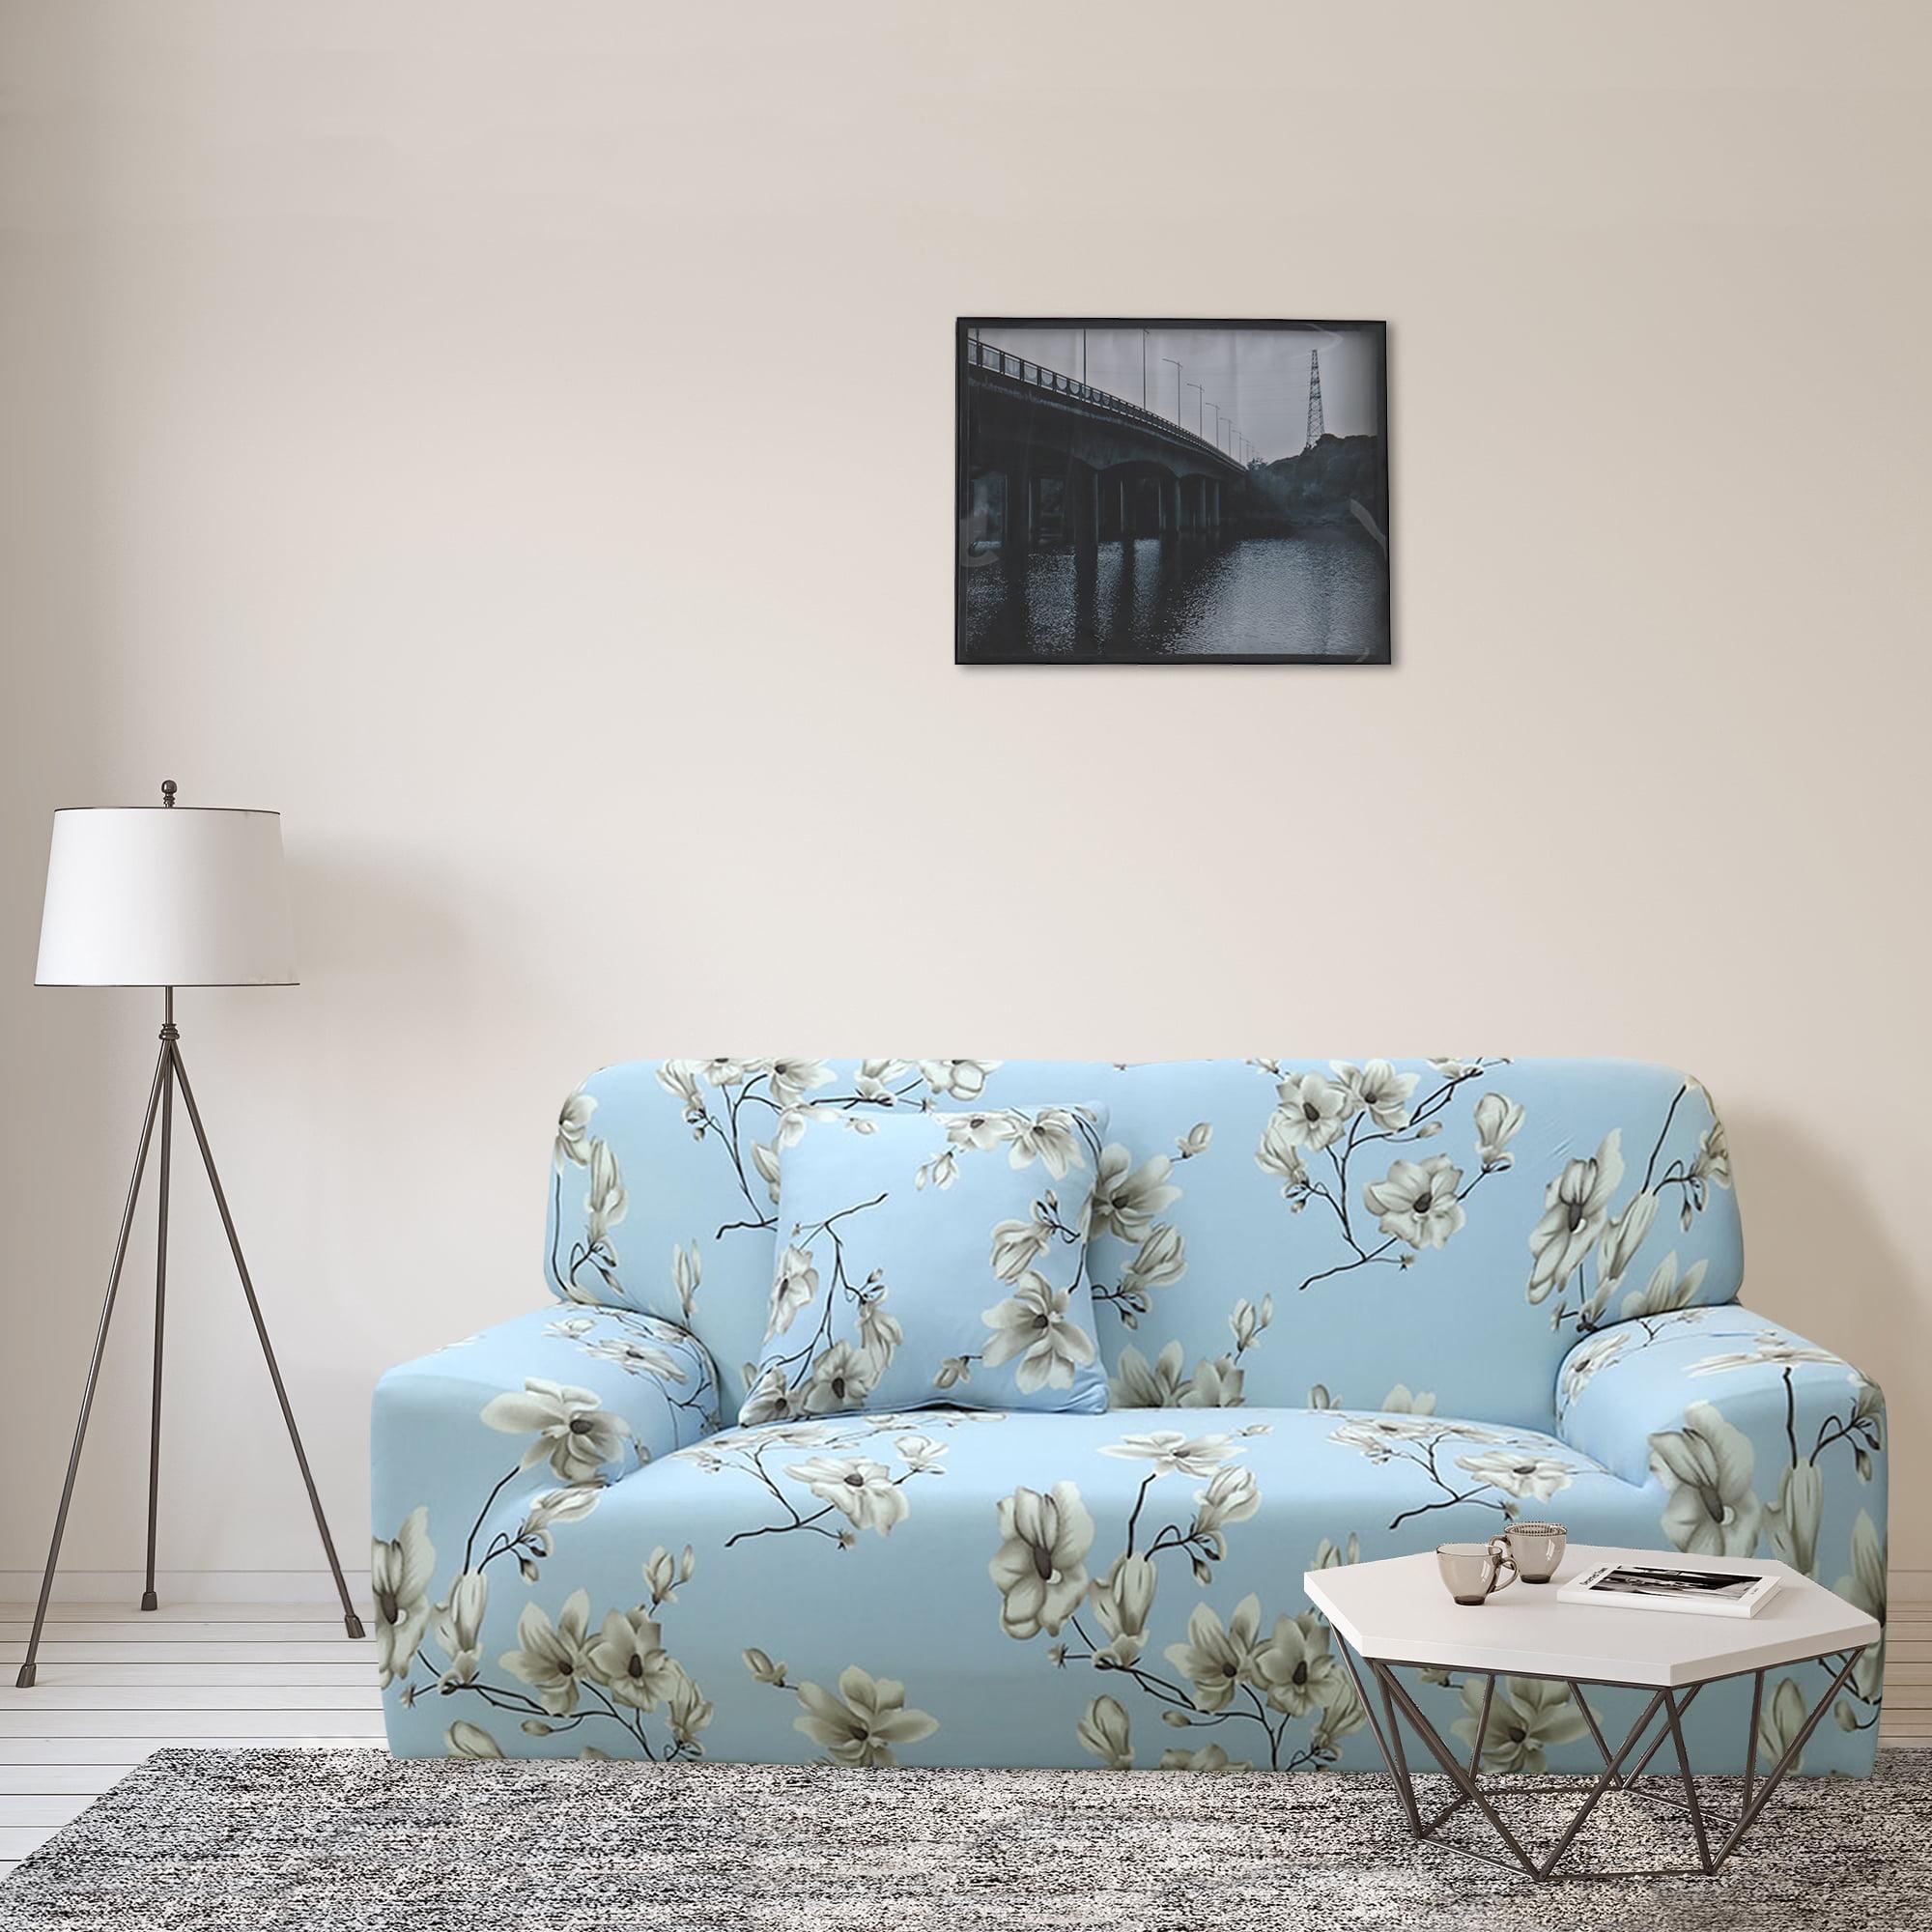 Surprising Home Stretch Sofa Cover Loveseat Couch Slipcovers 1 76 X 90 Inch Creativecarmelina Interior Chair Design Creativecarmelinacom